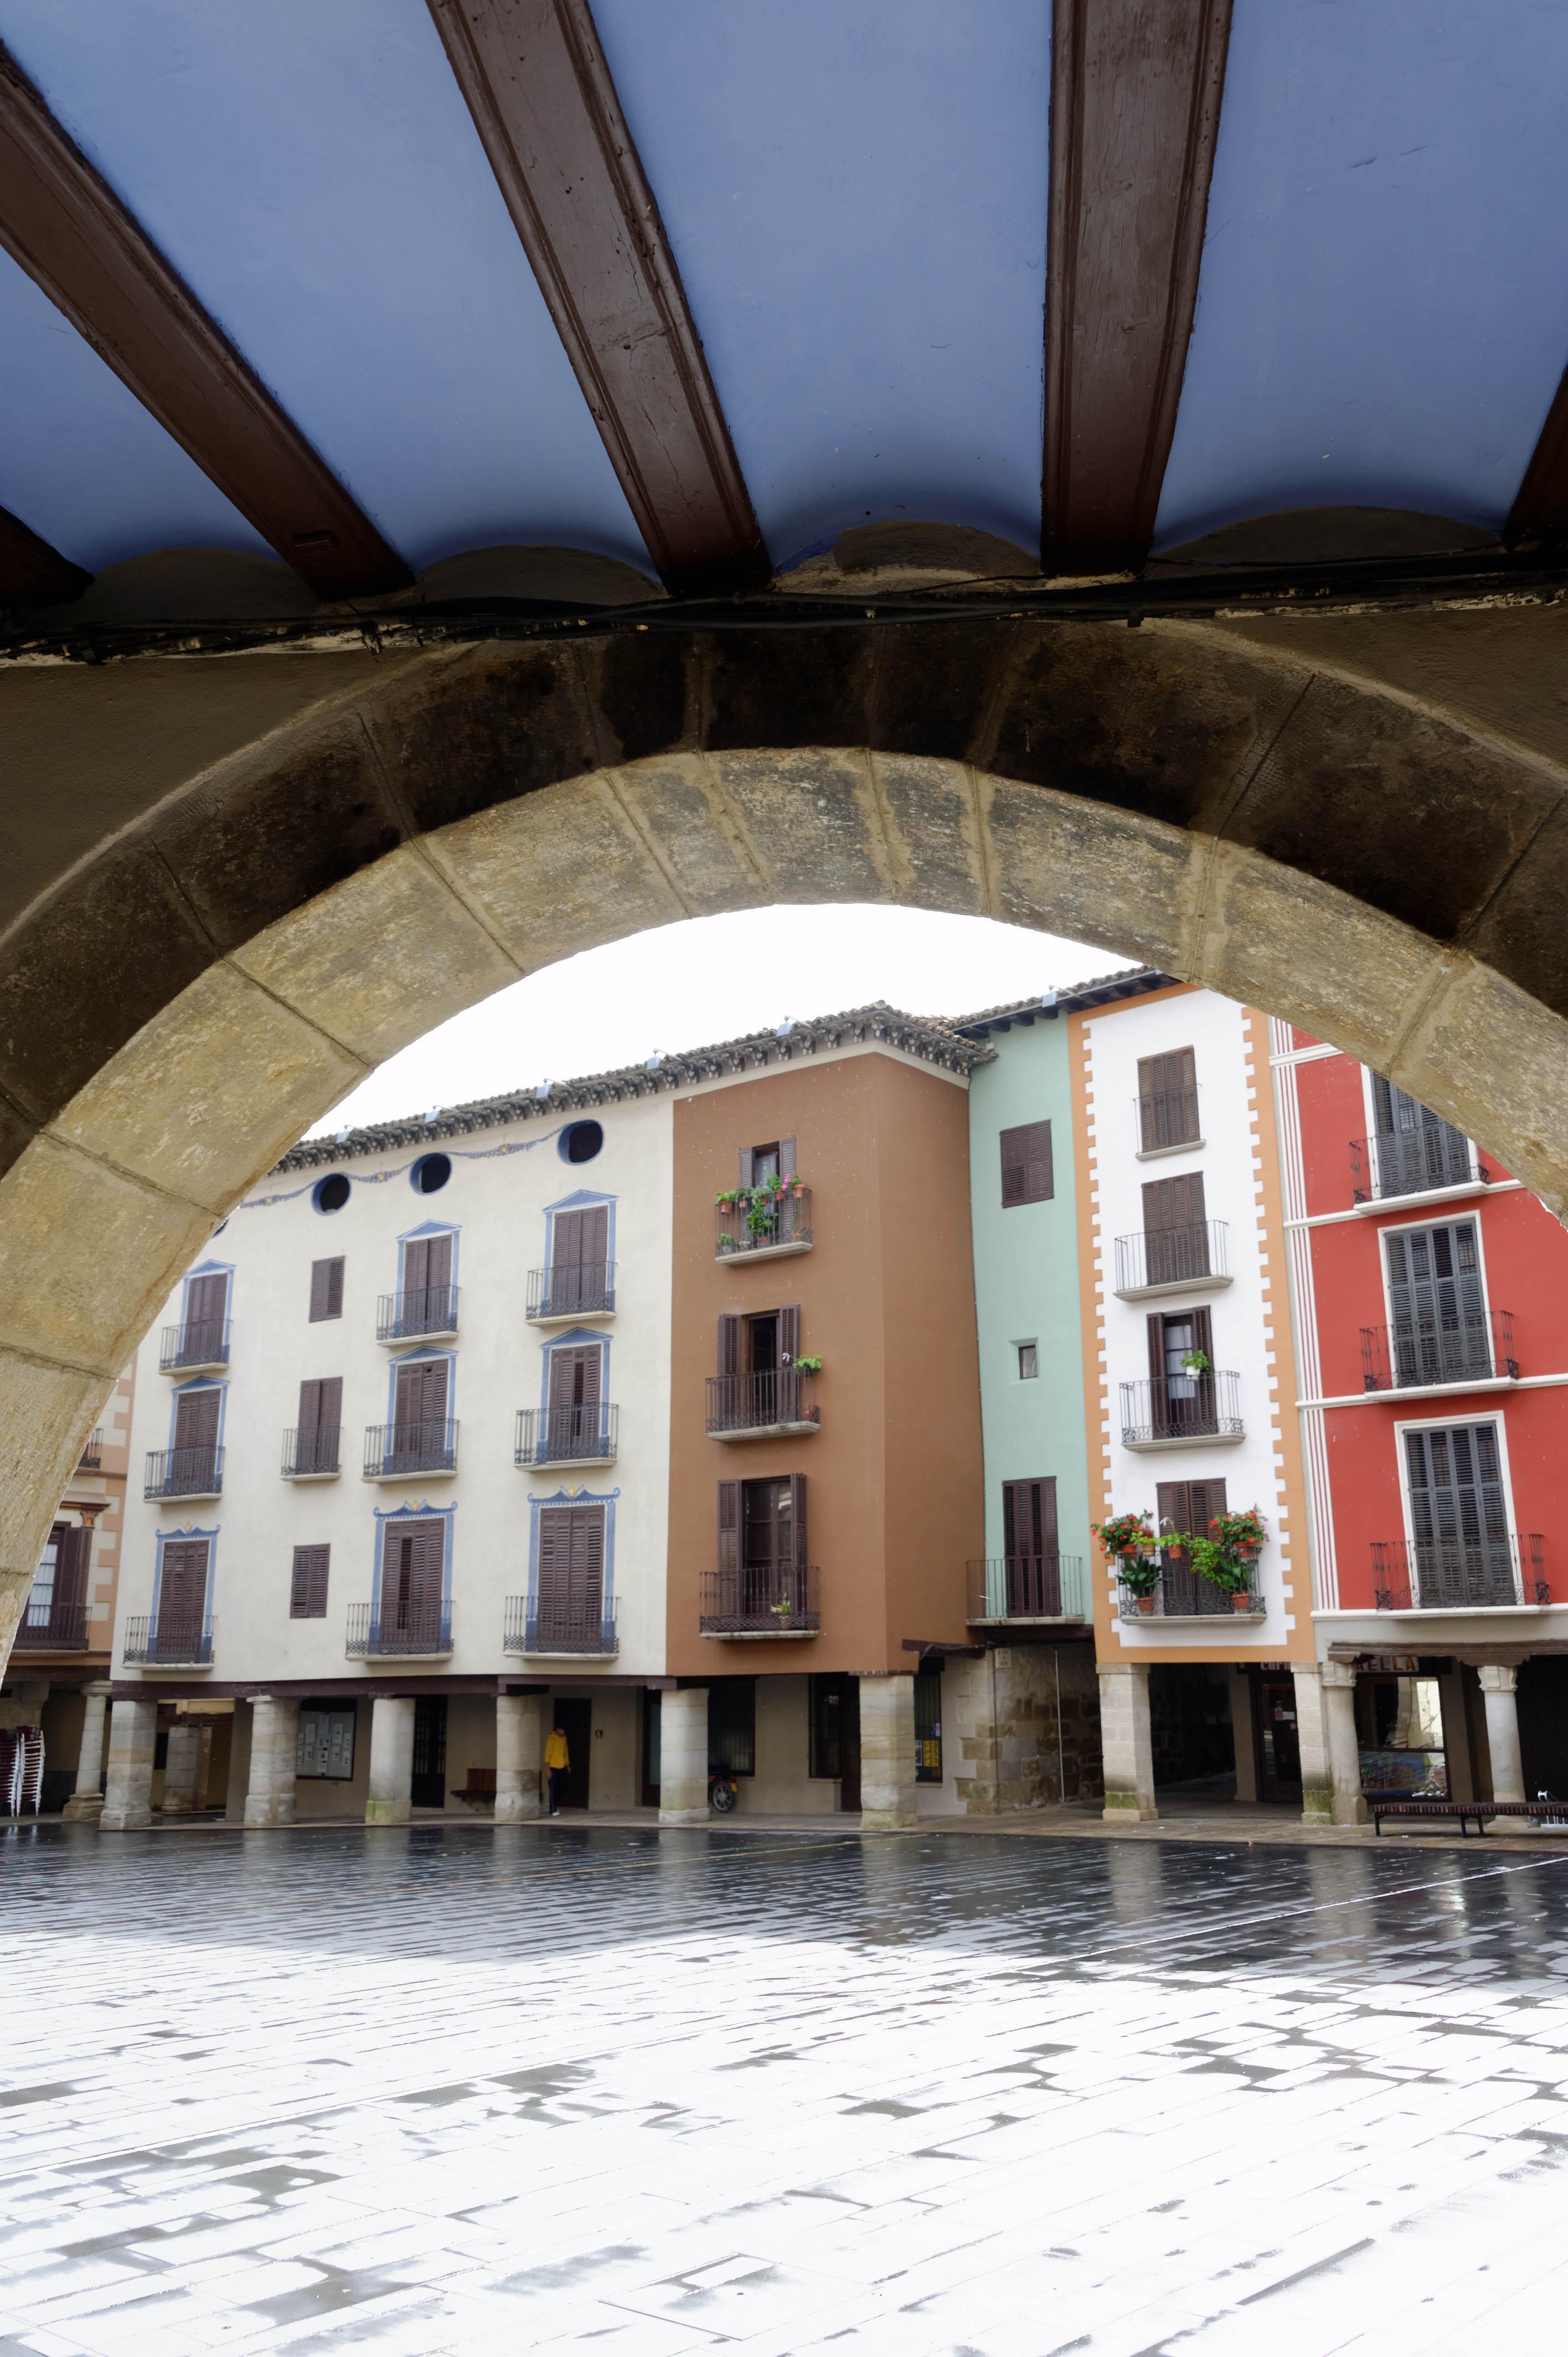 4331_Graus (Aragon)